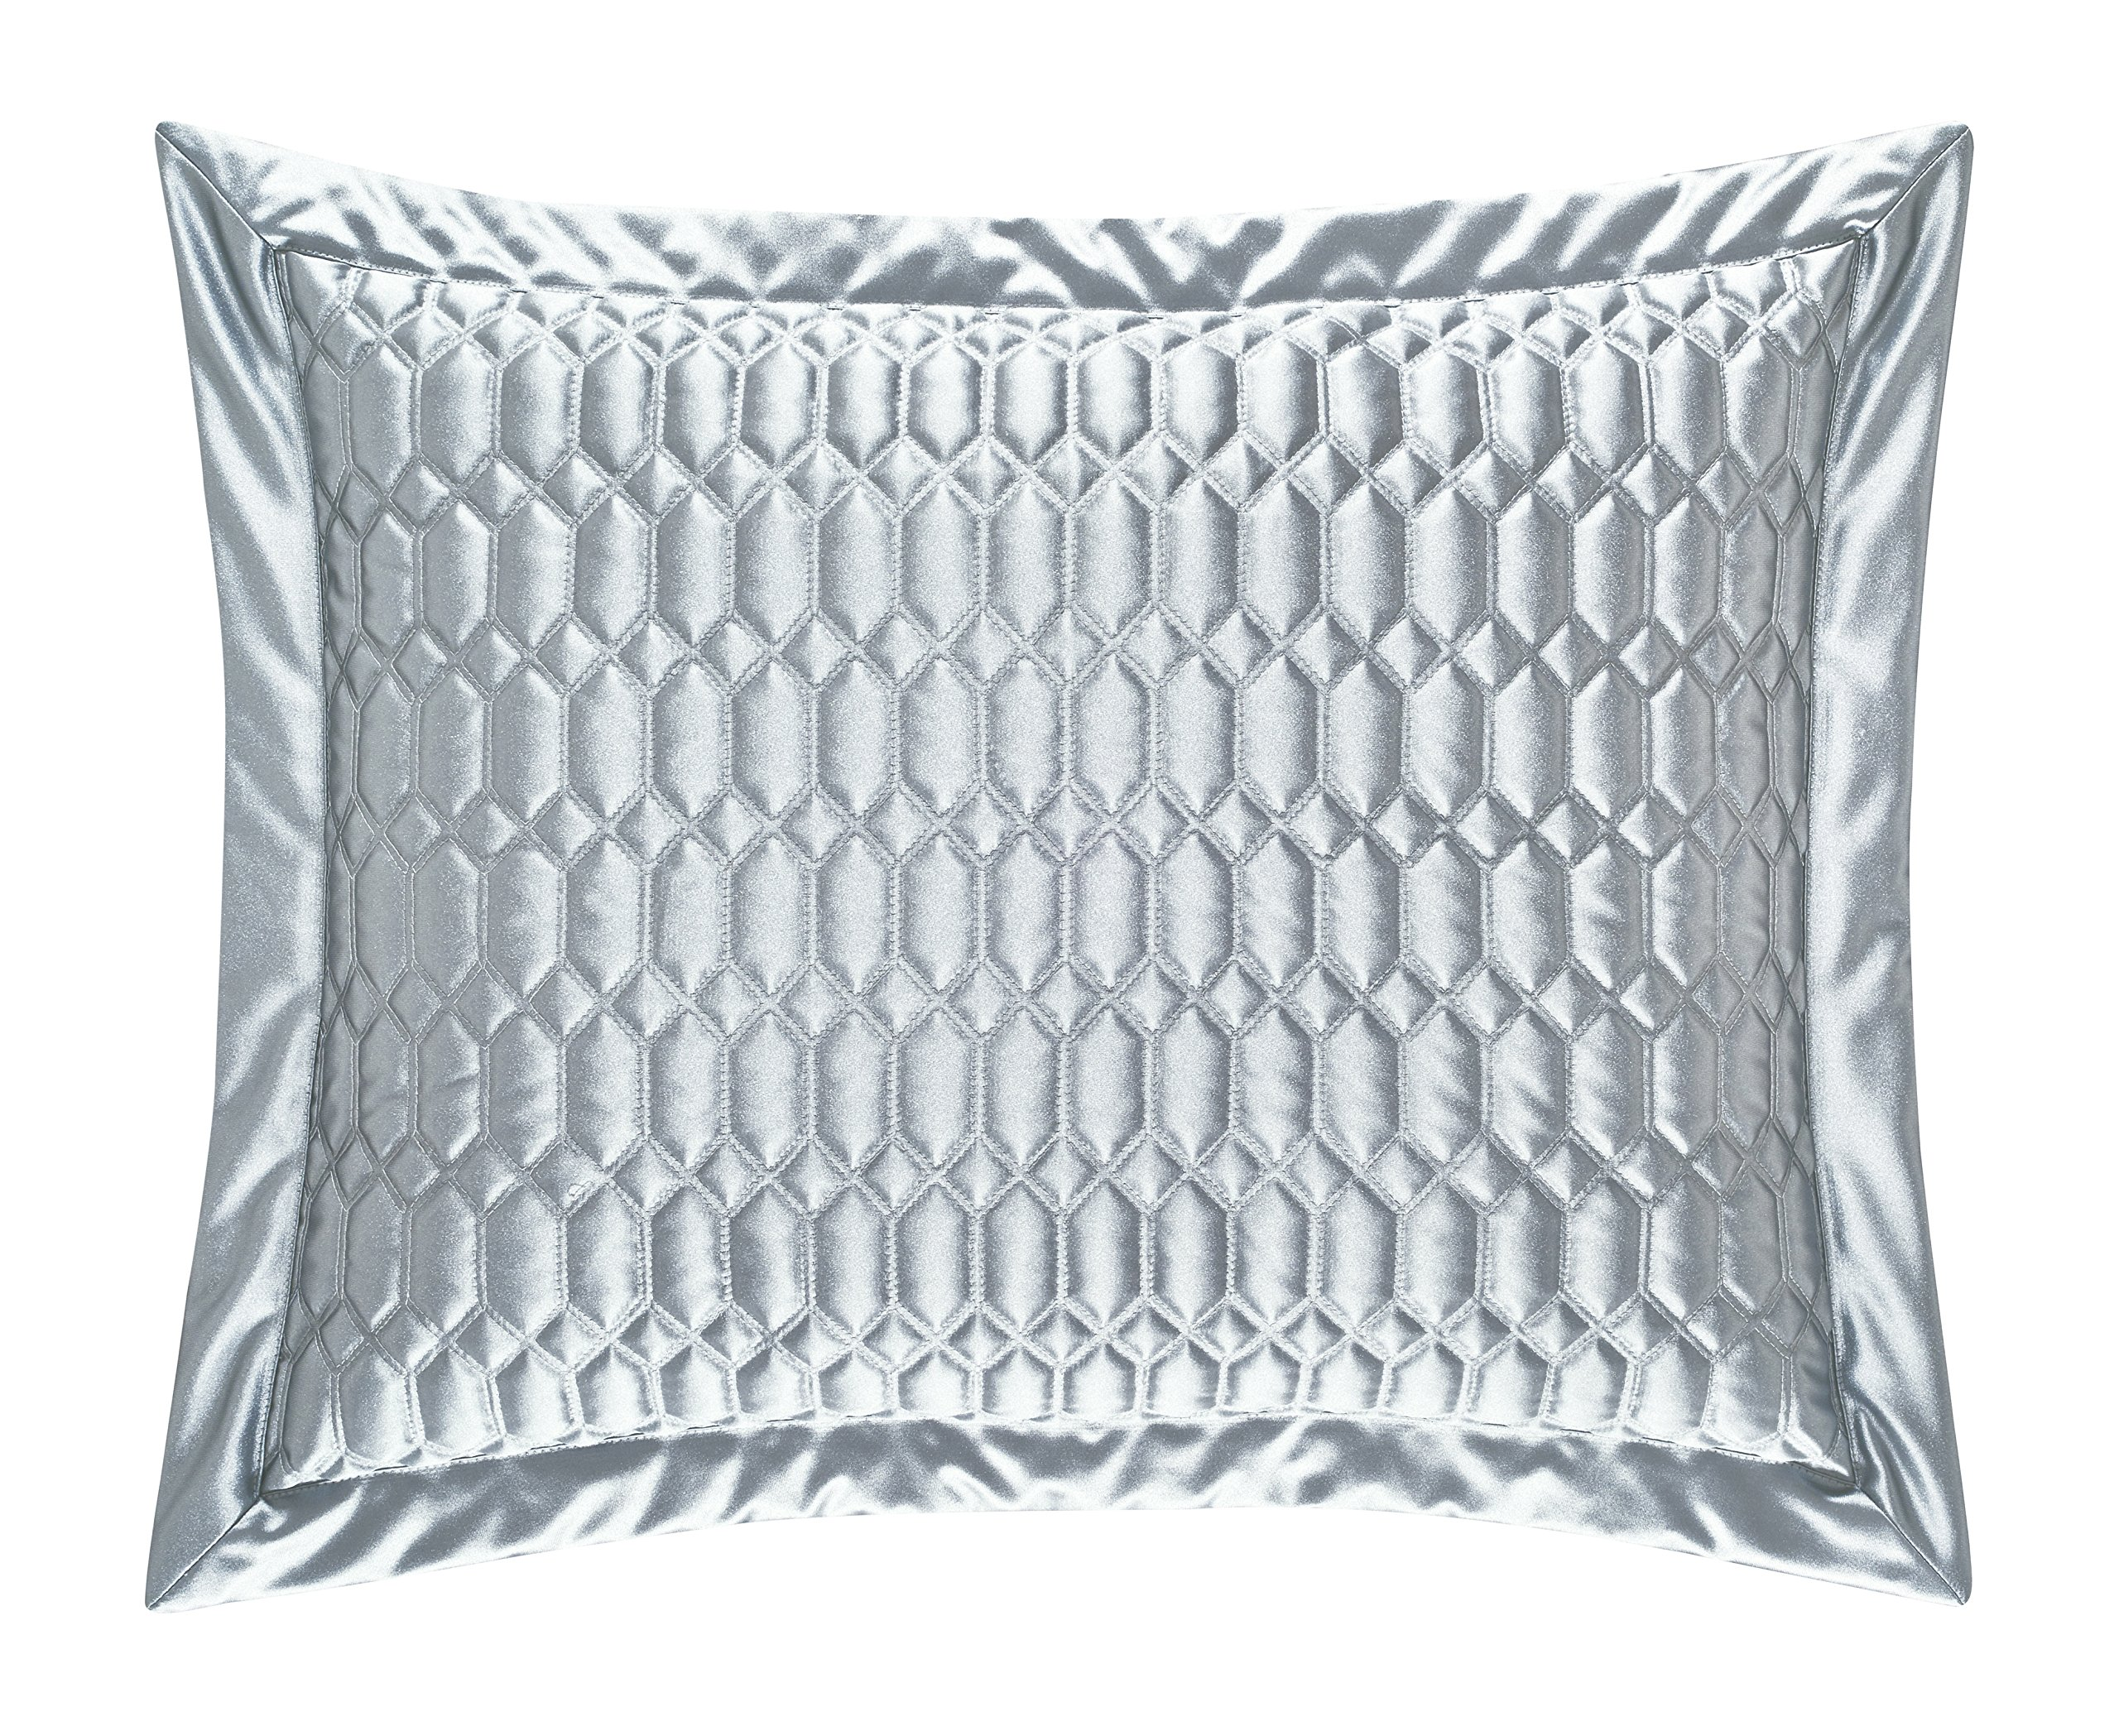 Five Queens Court Saranda Satin Geometric Quilted Pillow Sham Standard, Spa